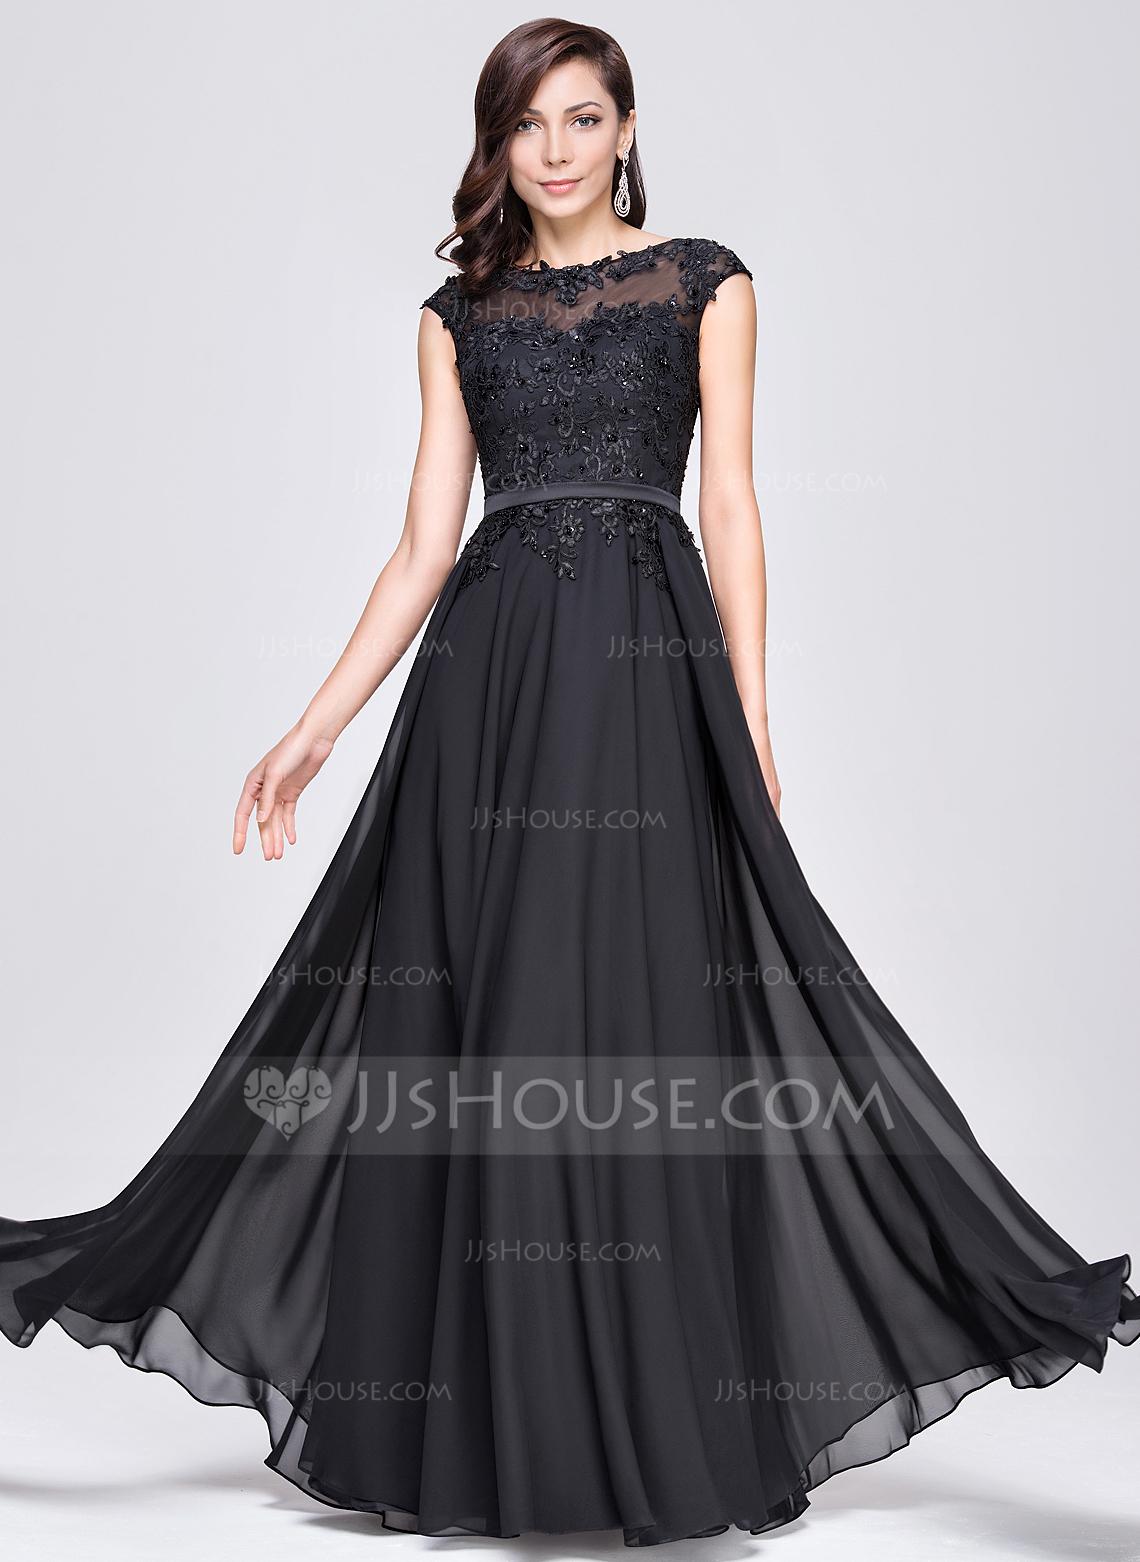 Images of Dresses For Evening - Reikian